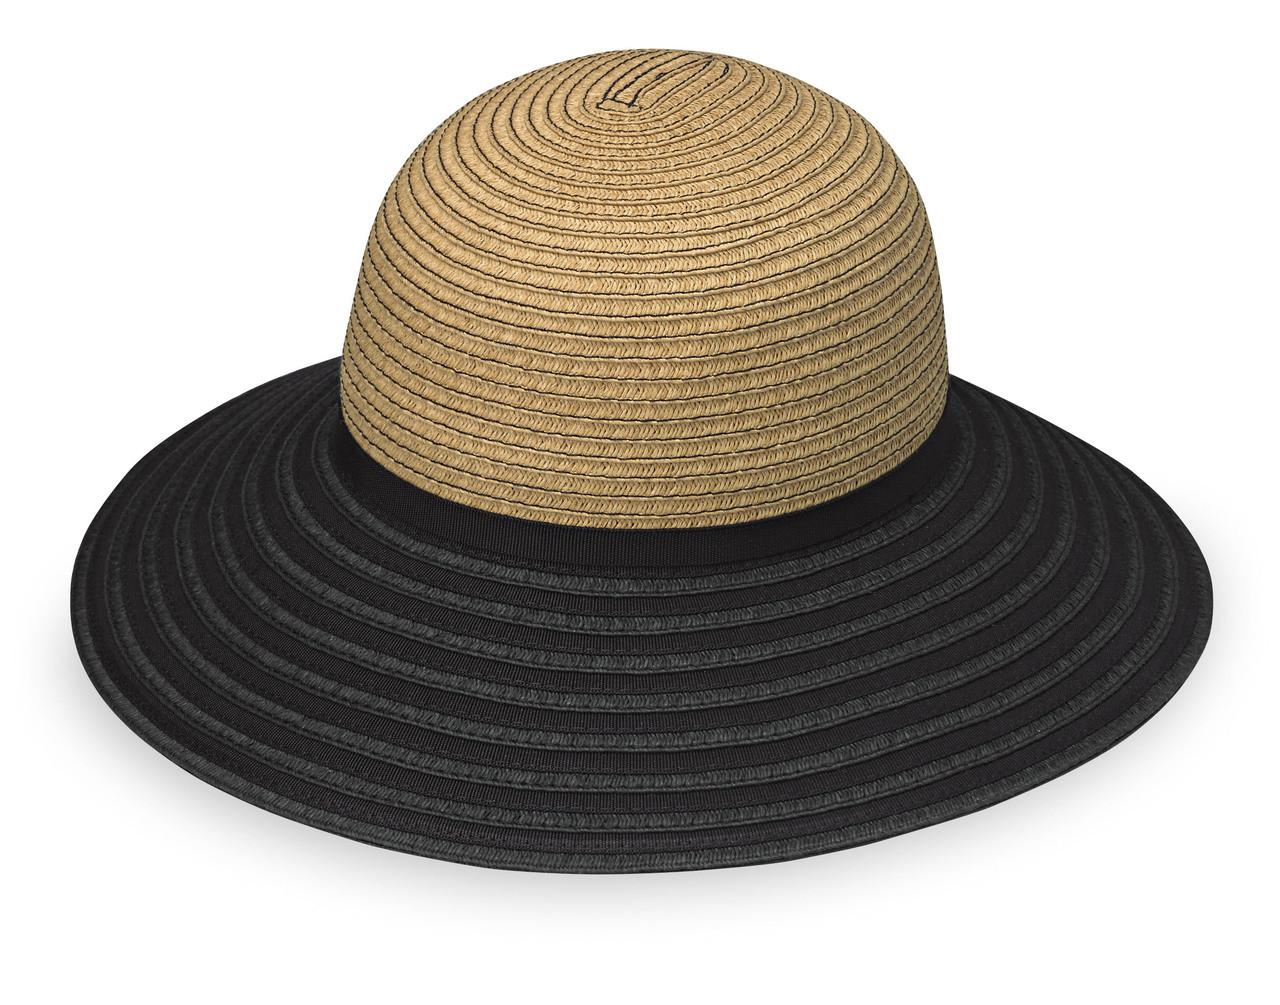 de19ca6fc9d Wollaroo hat company riviera upf50 sun hat